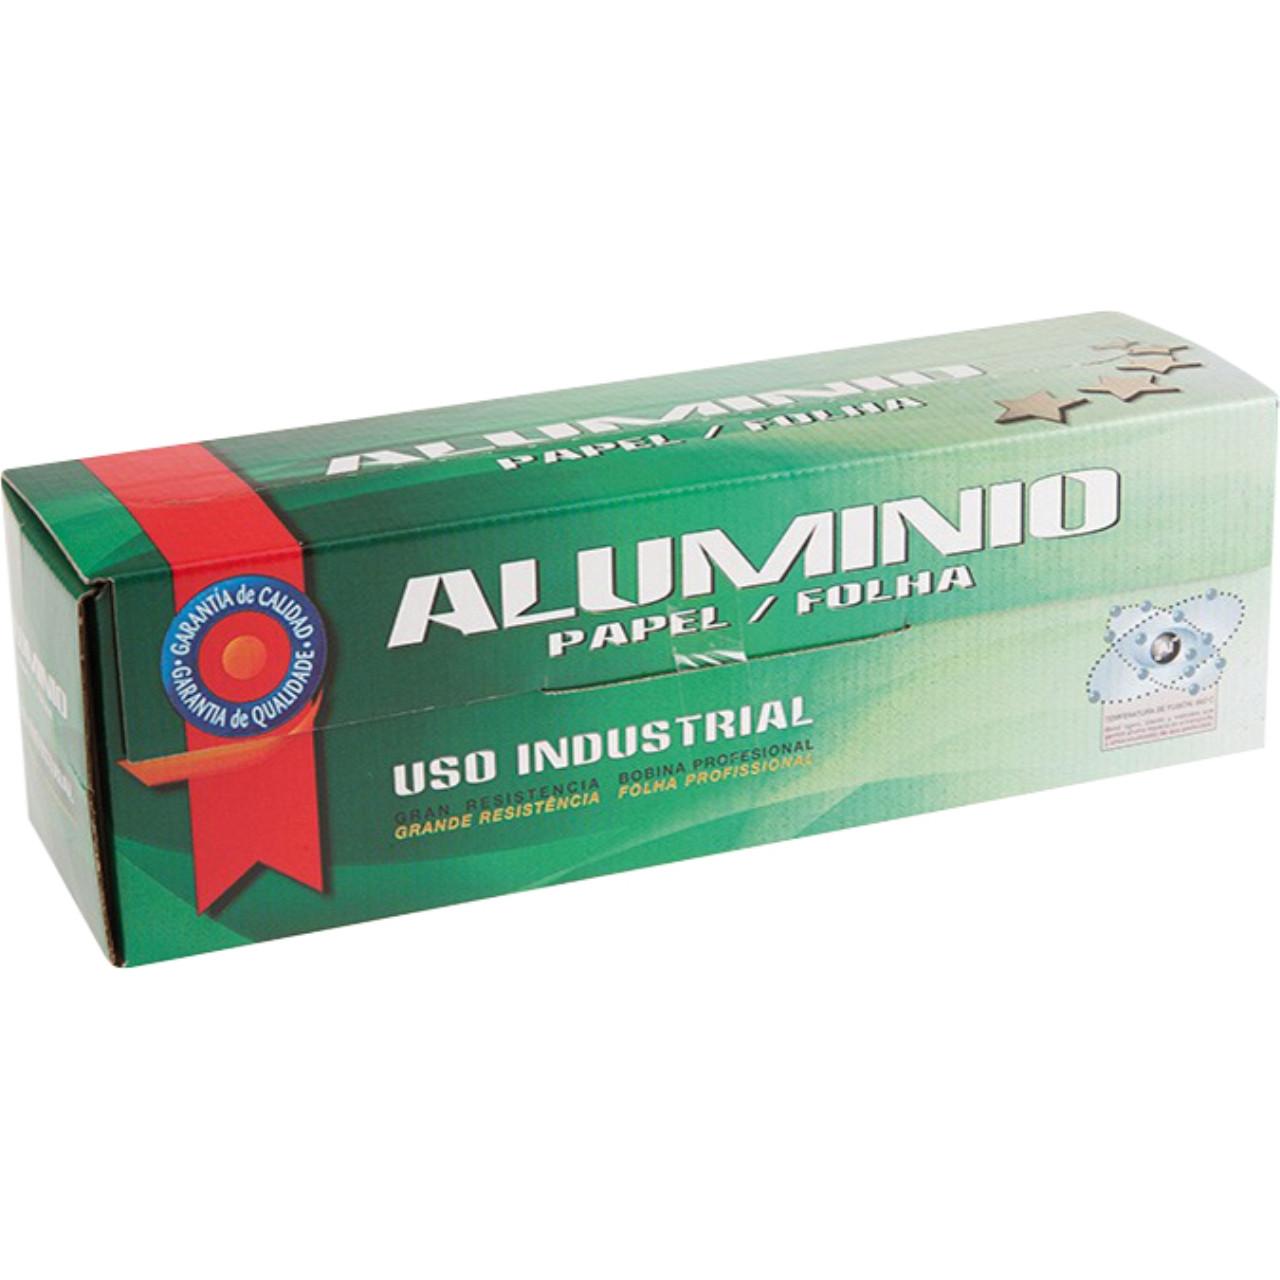 Alumini 11 micres 30x200